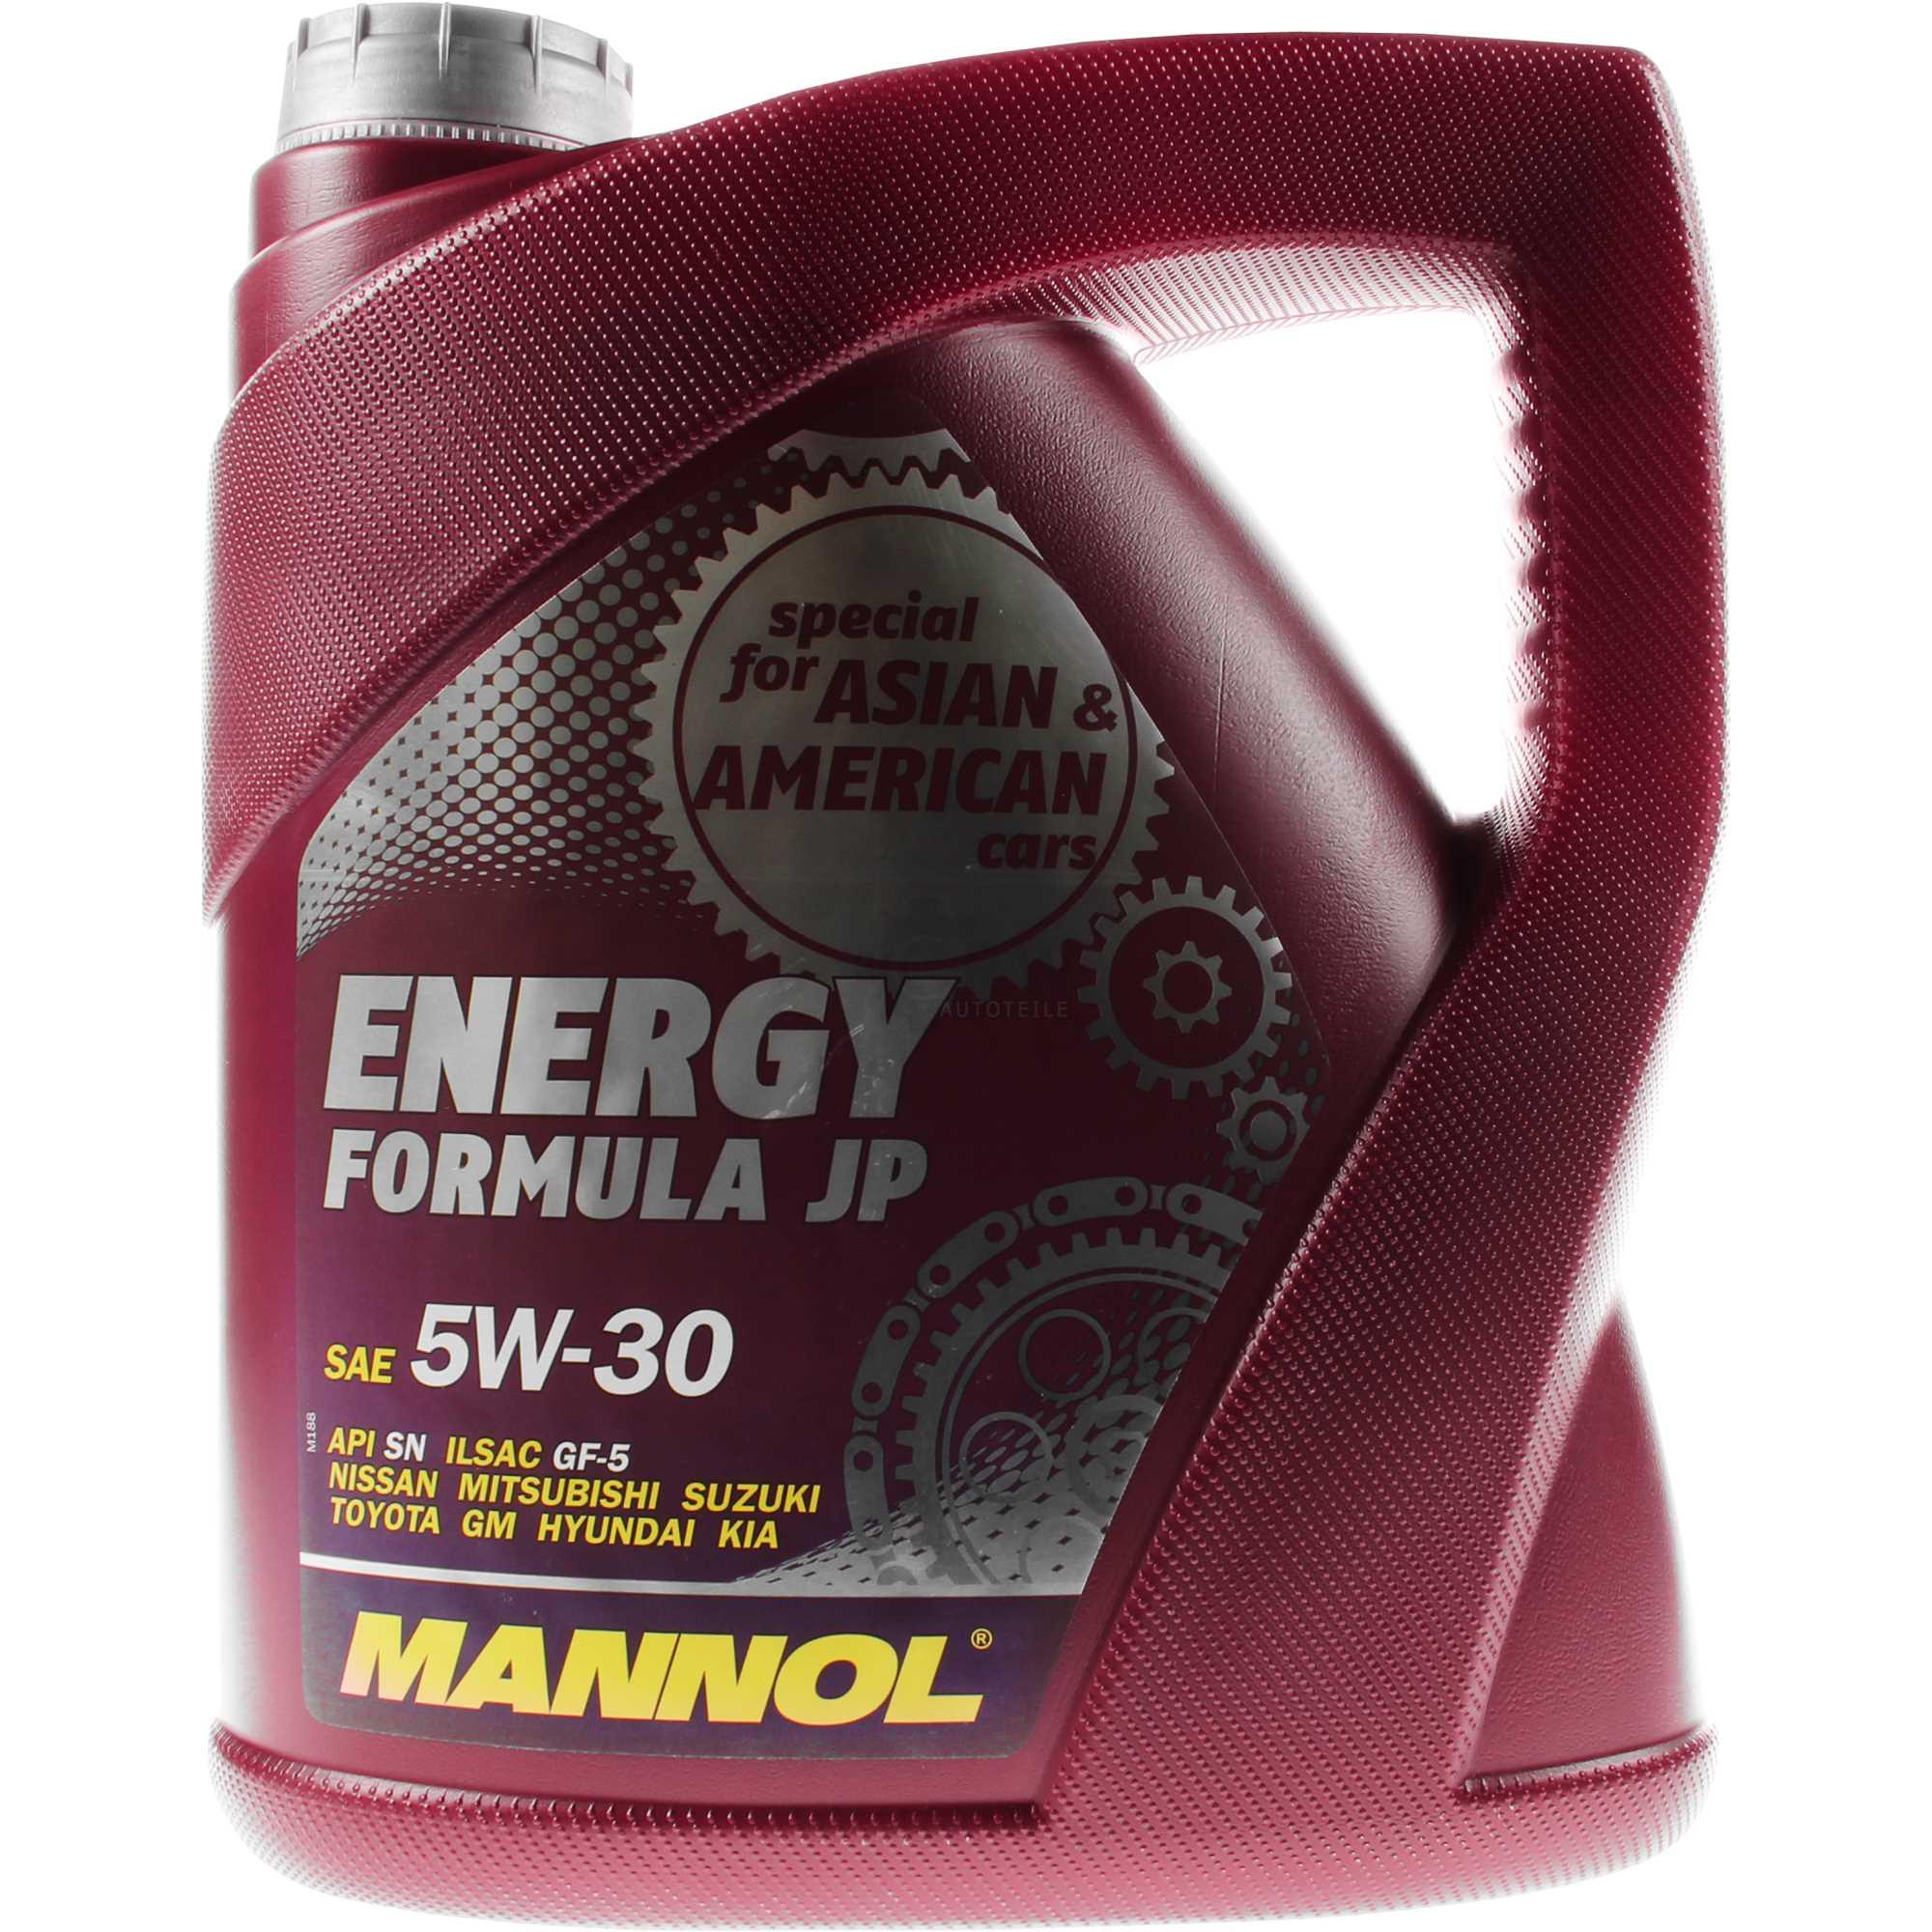 Aceite-del-motor-aceite-5w40-10w40-15w40-5w30-10w60-1l-4l-5l-7l-10l-20l miniatura 44